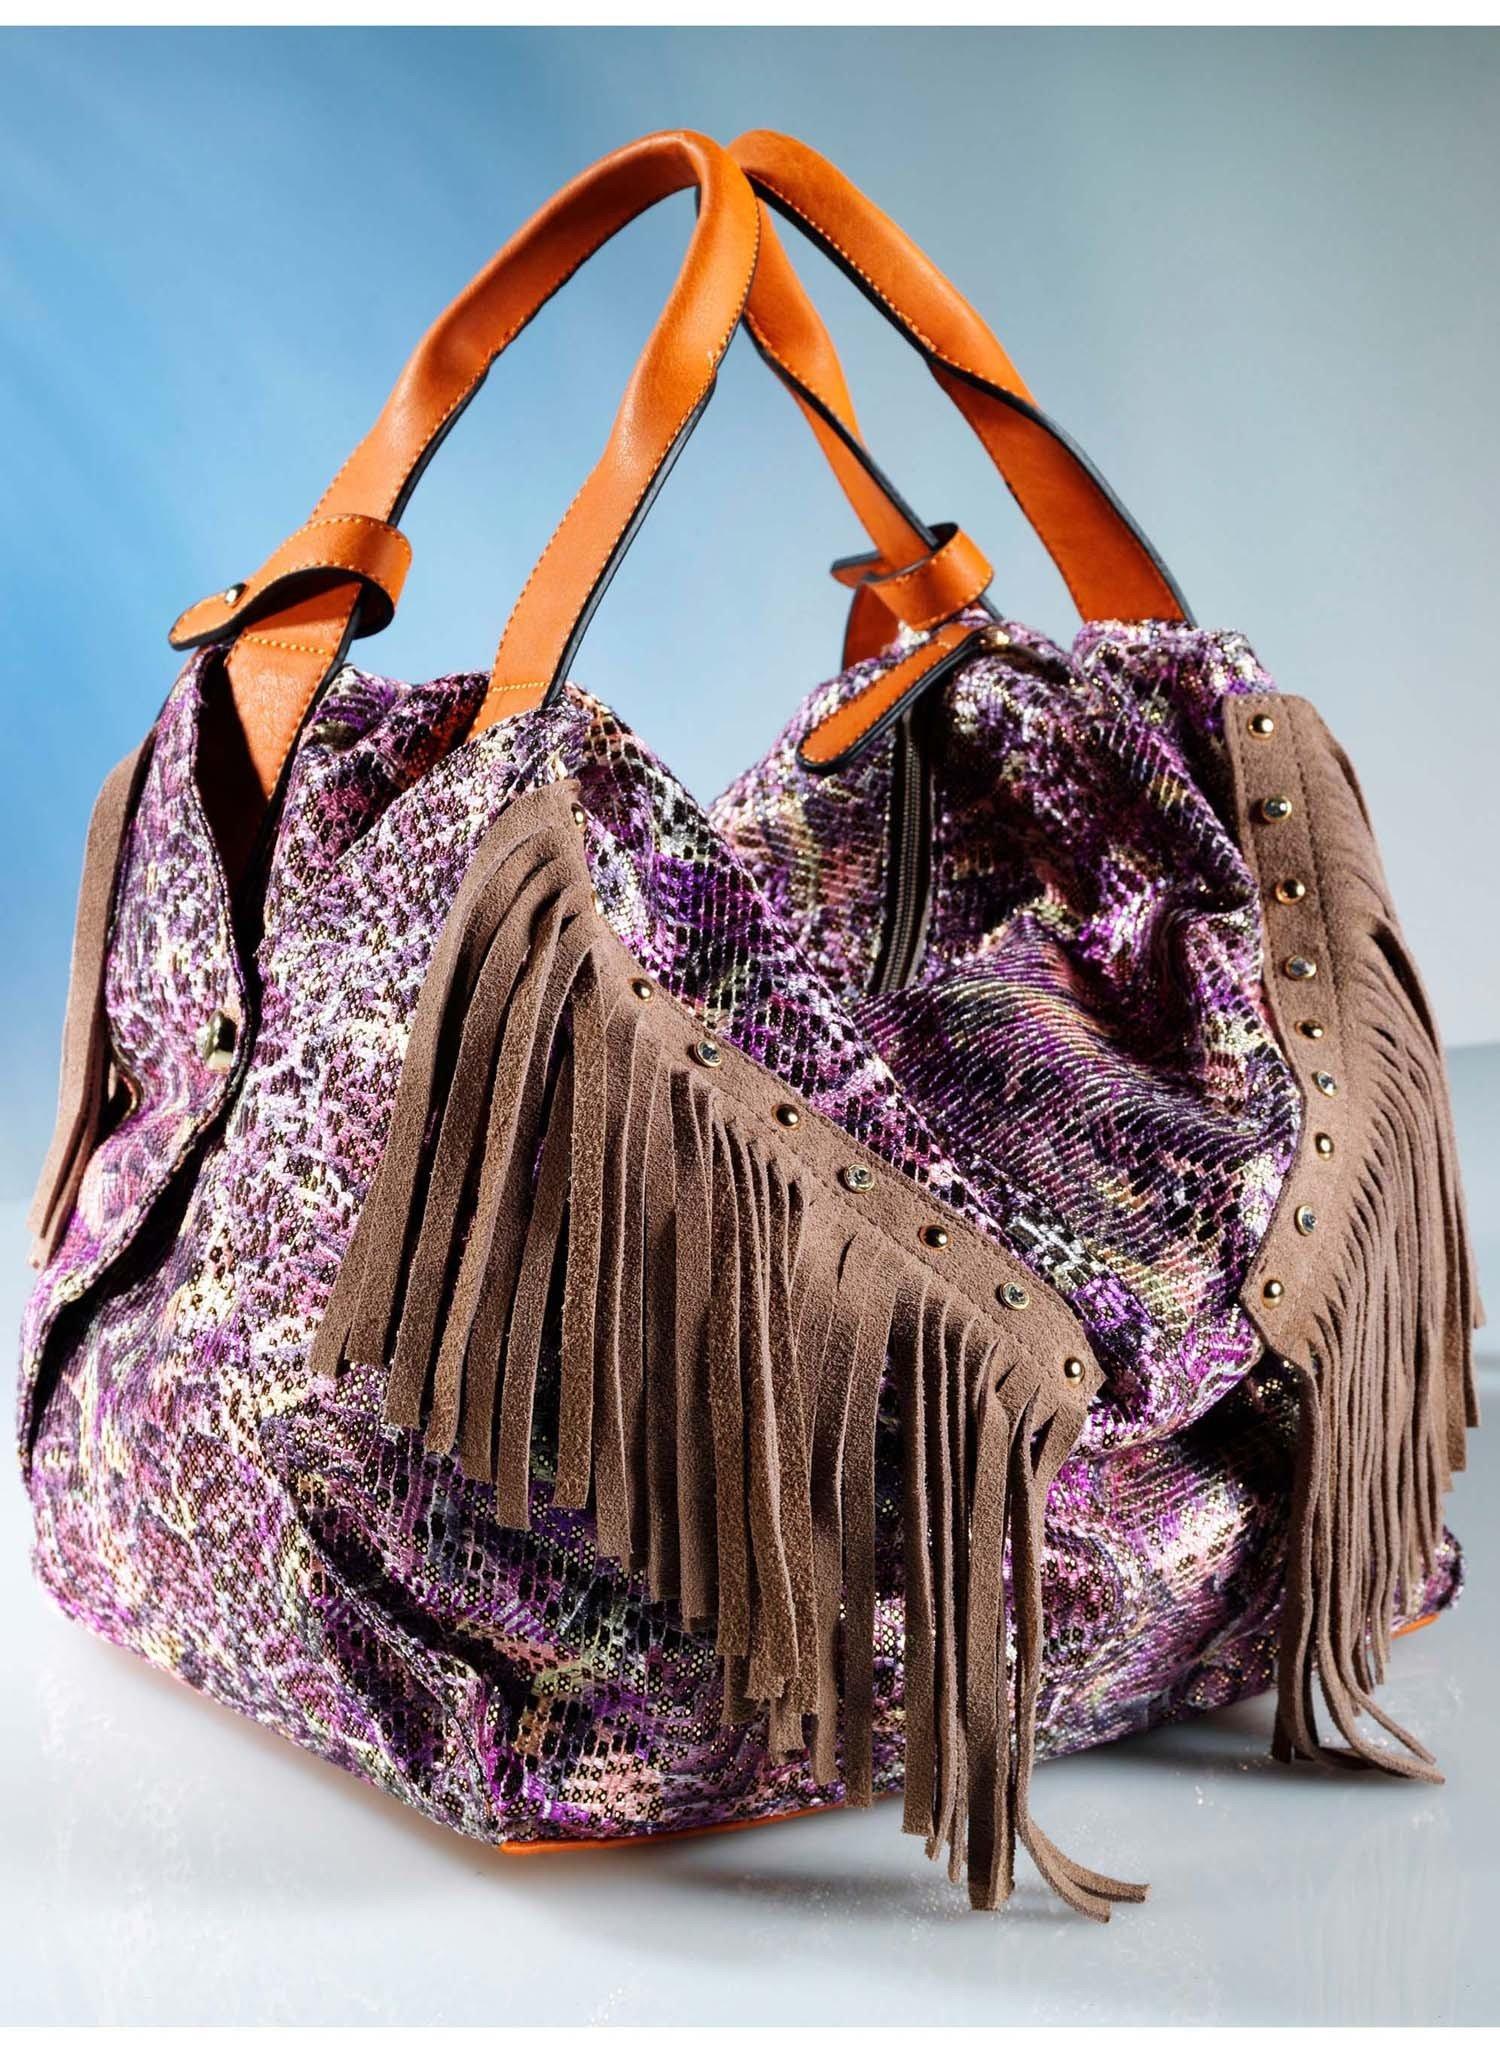 D-Handtasche,Franse,multicolor